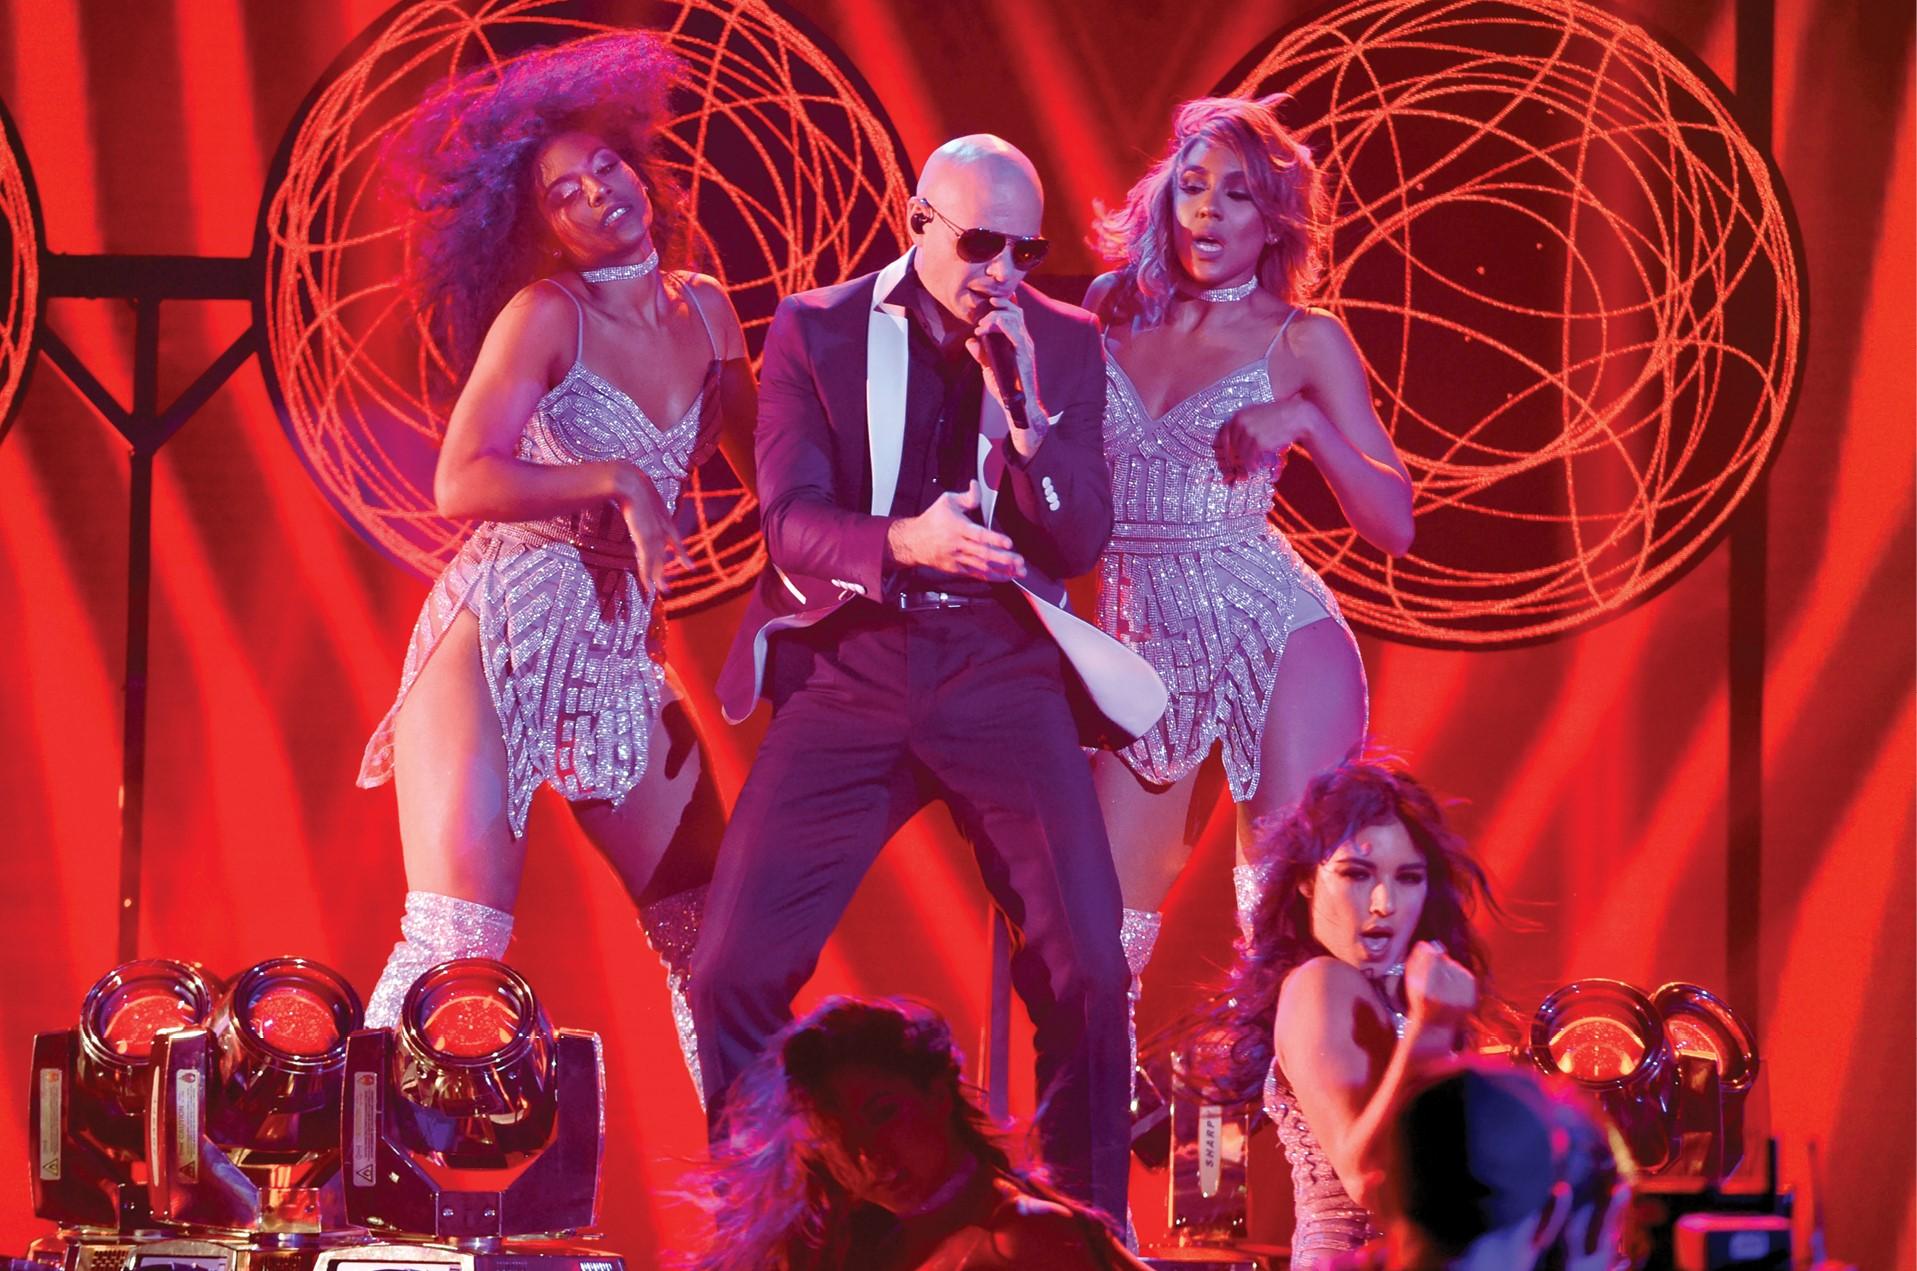 Reconocen trayectoria de Pitbull